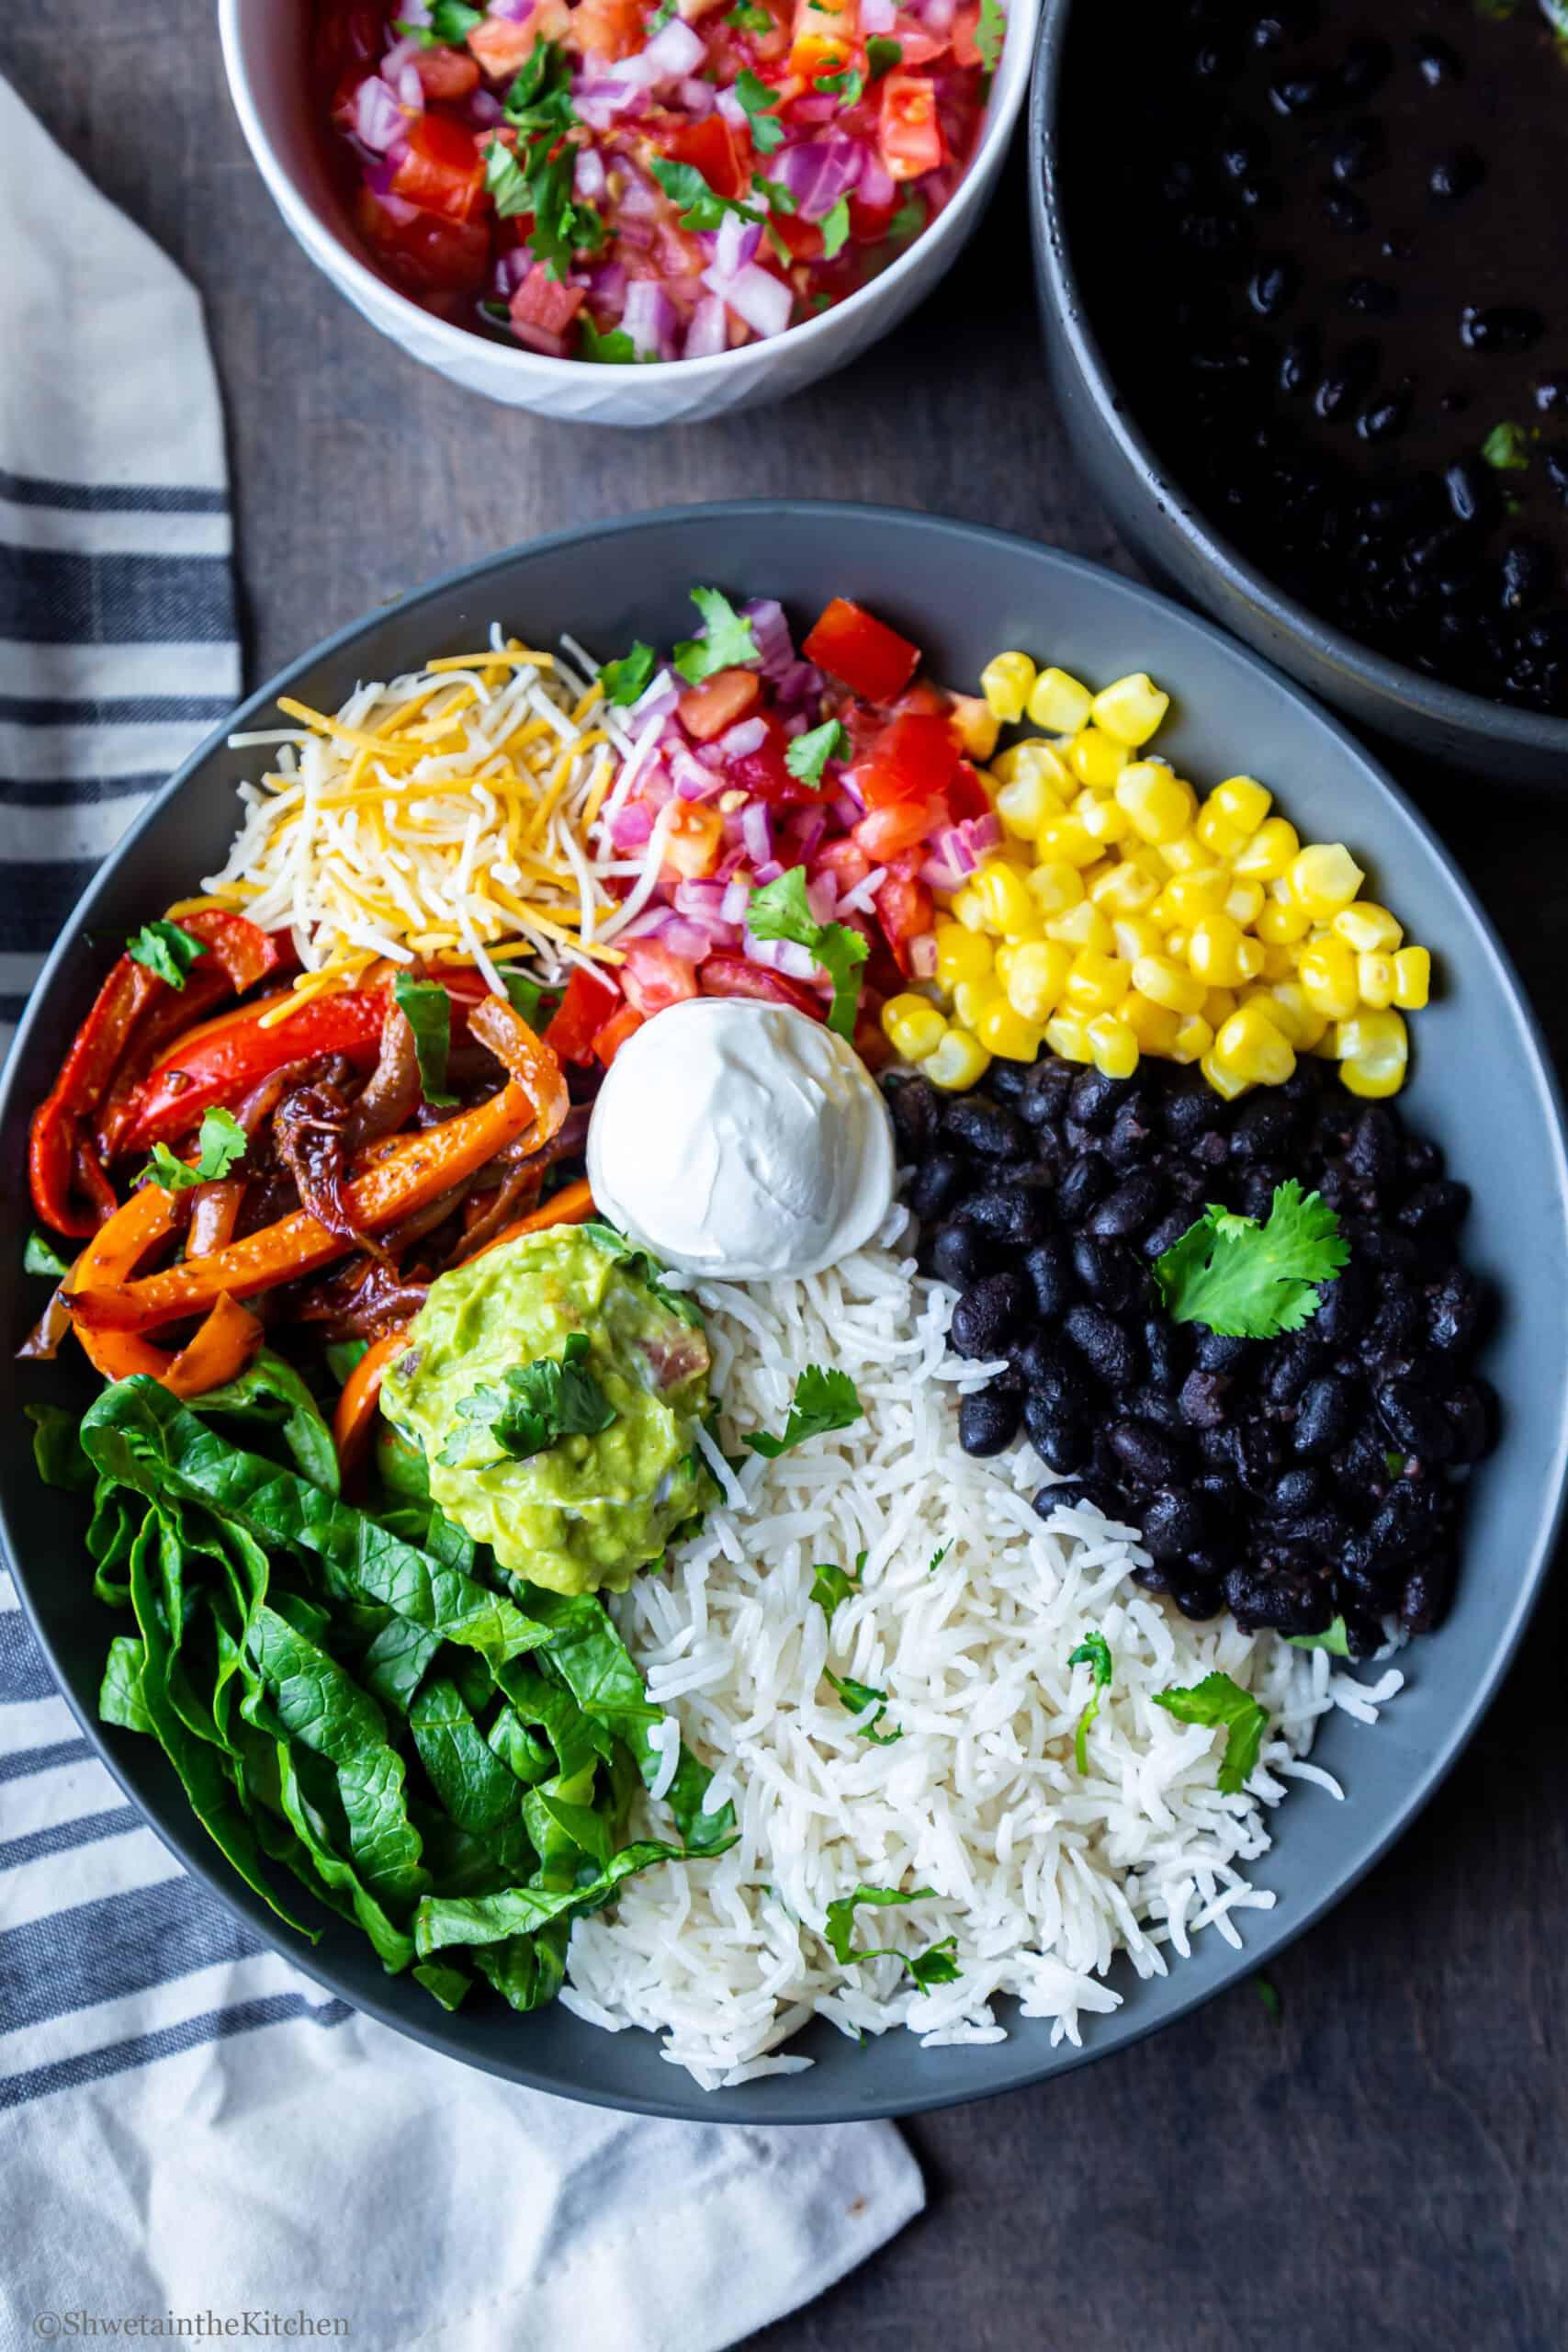 Alternatif untuk Pengganti Bahan-bahan Masakan Meksiko di Rumah